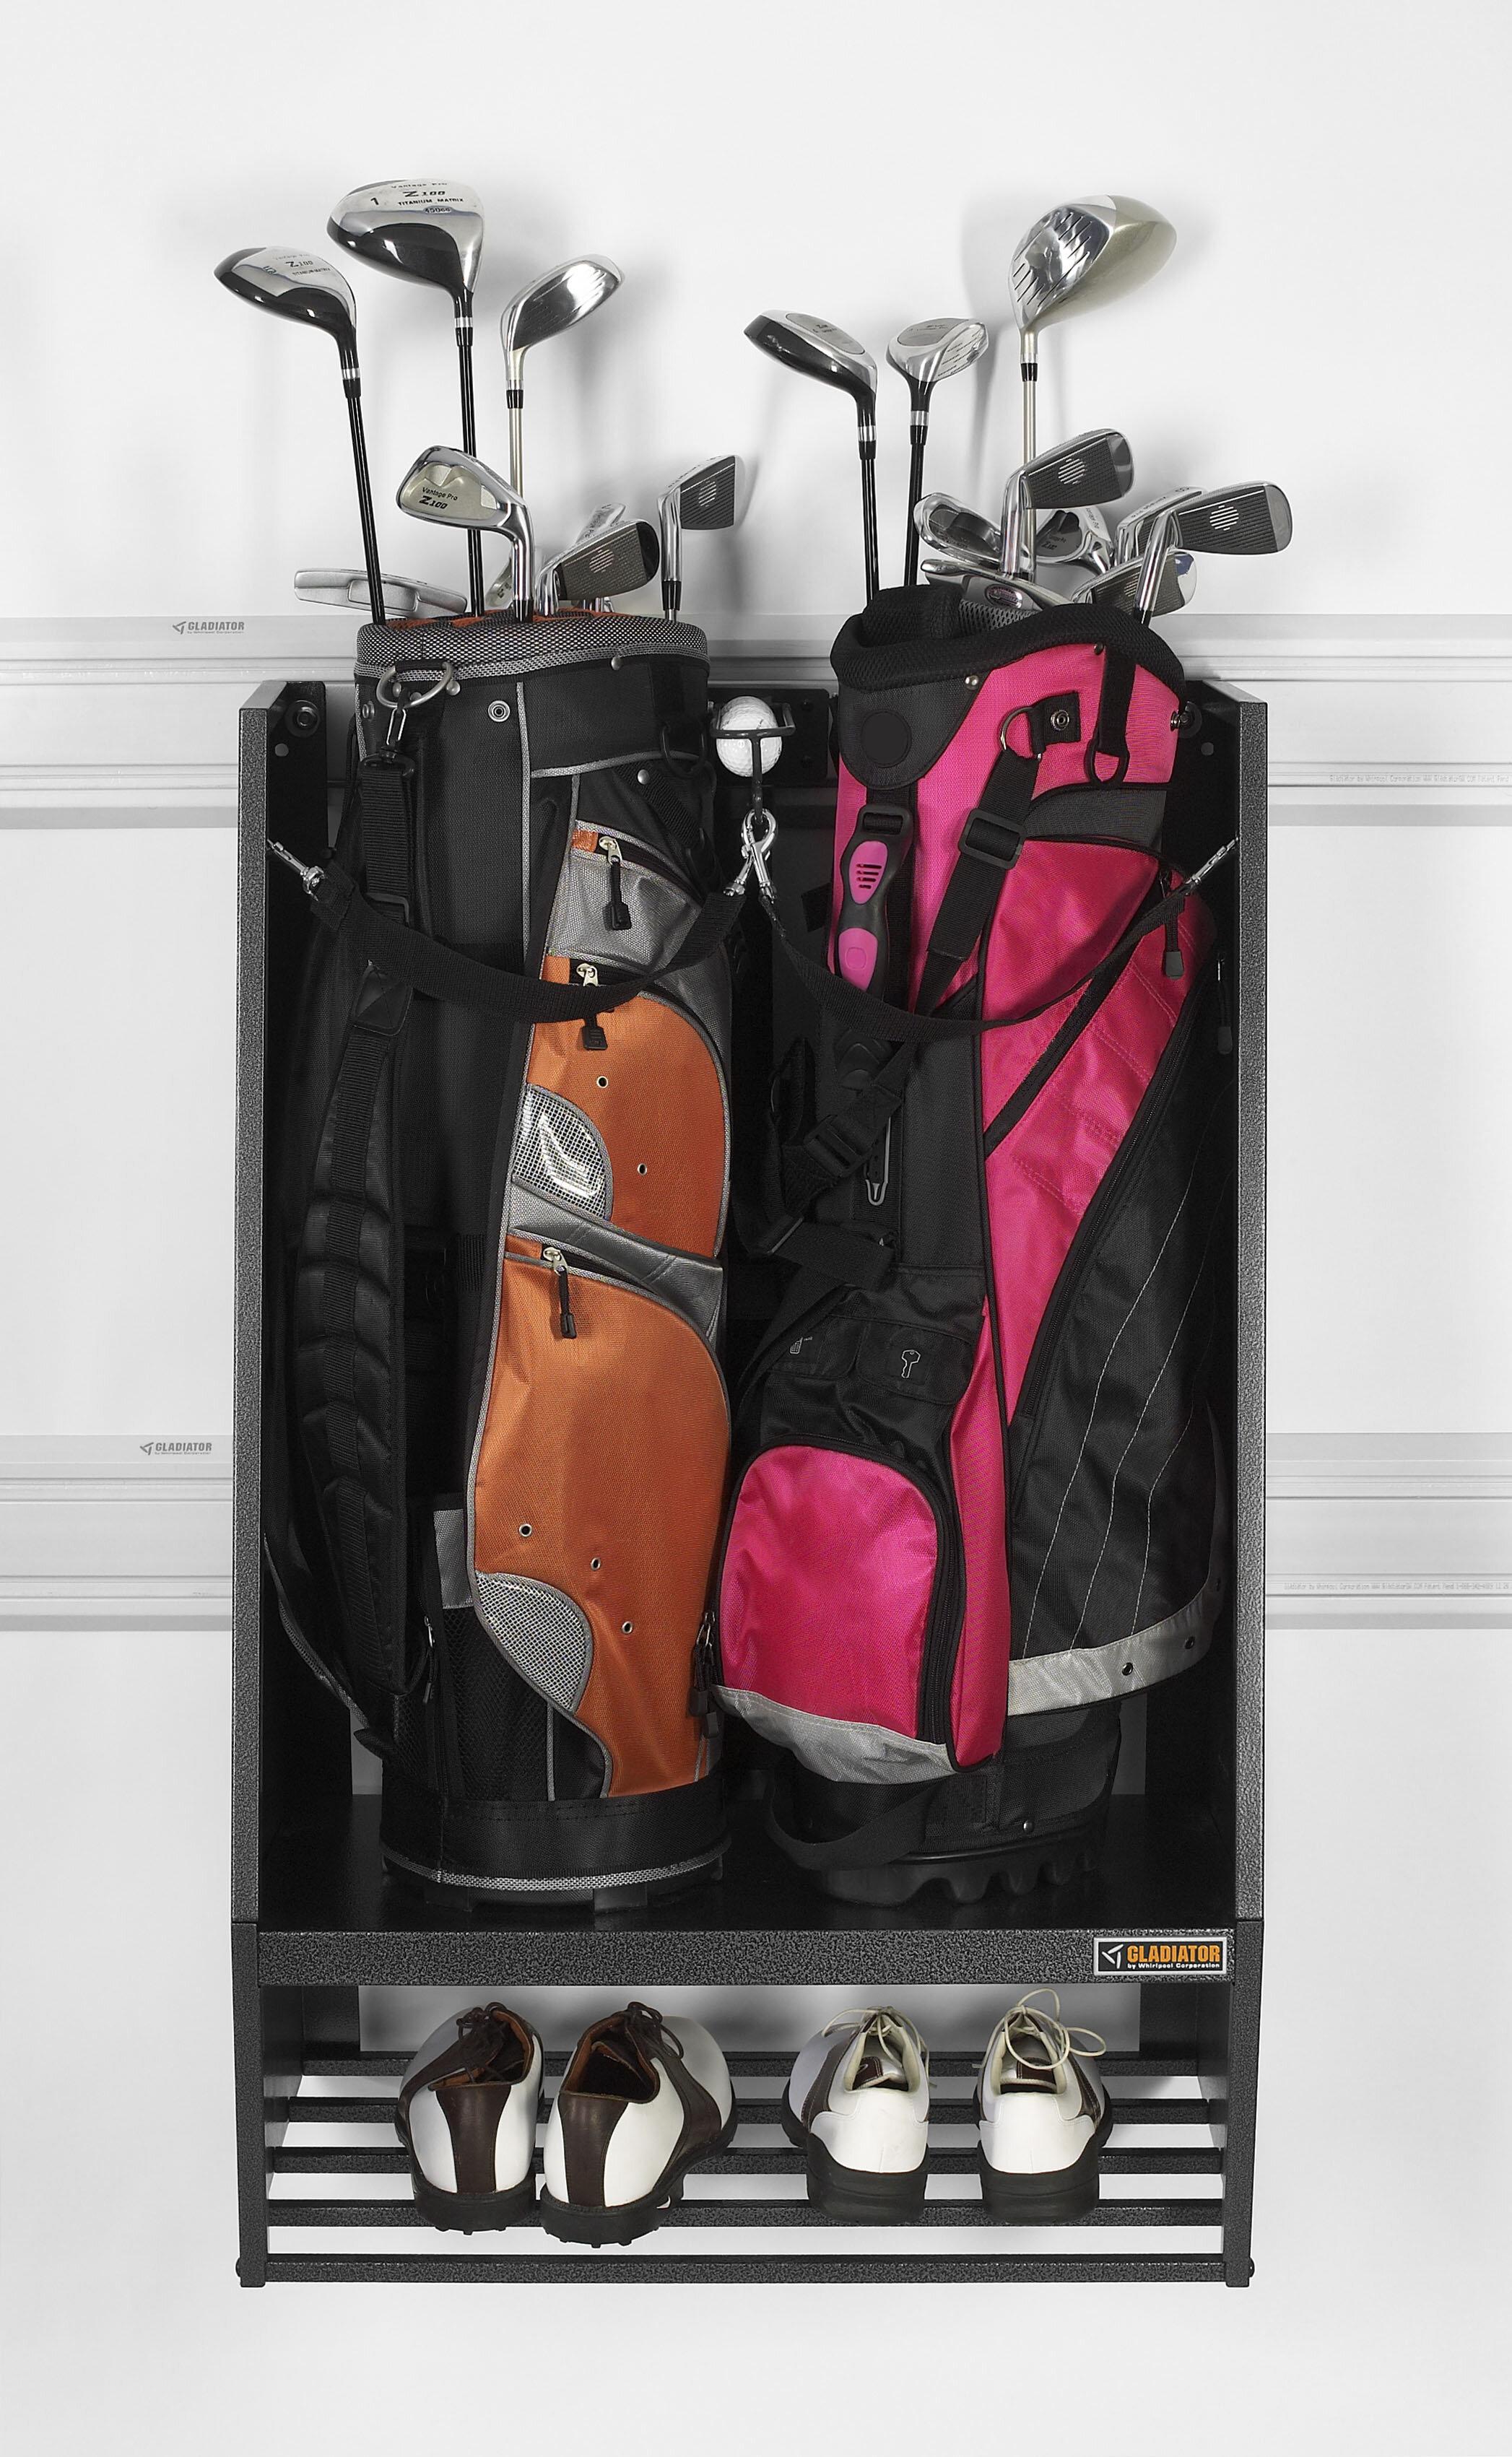 Gladiator Premier Series Golf Caddy Storage Wall Mounted